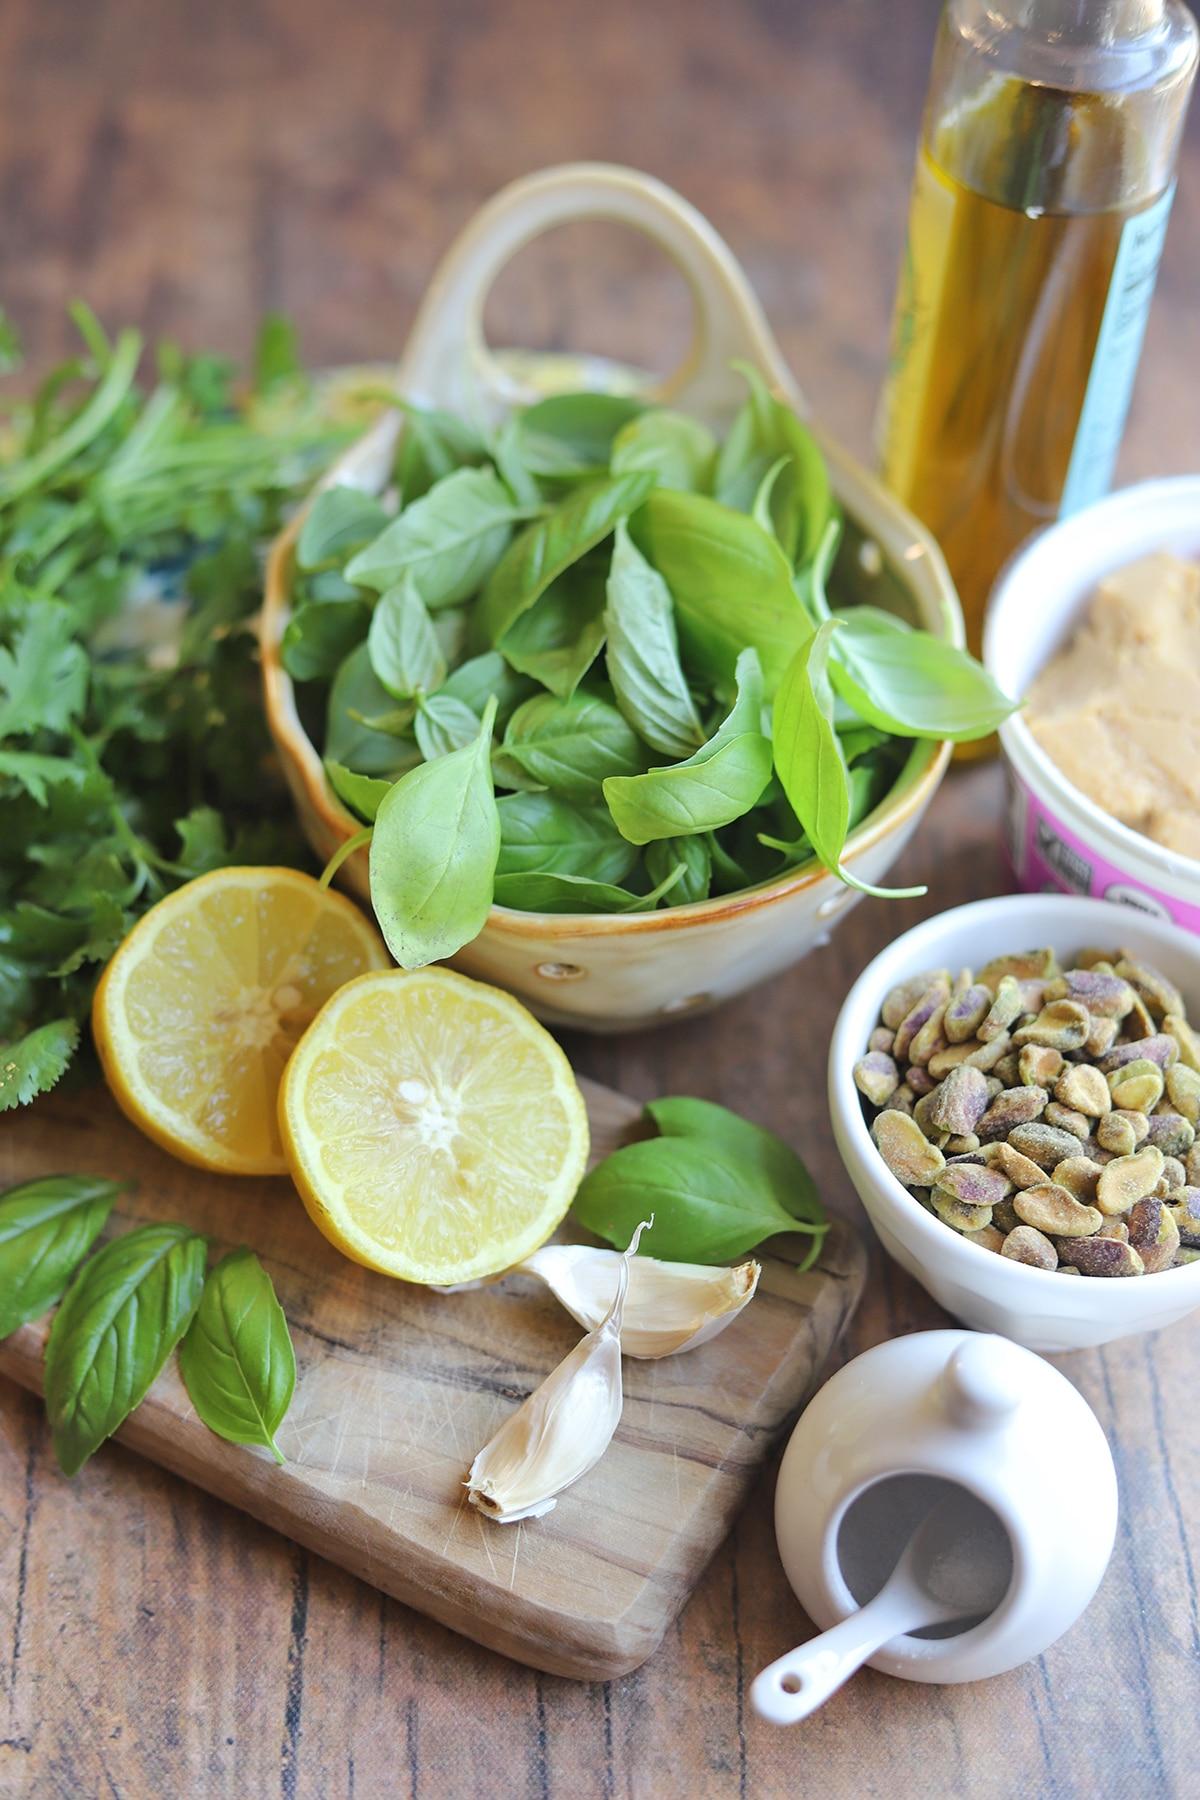 Ingredients for pistachio pesto on table.